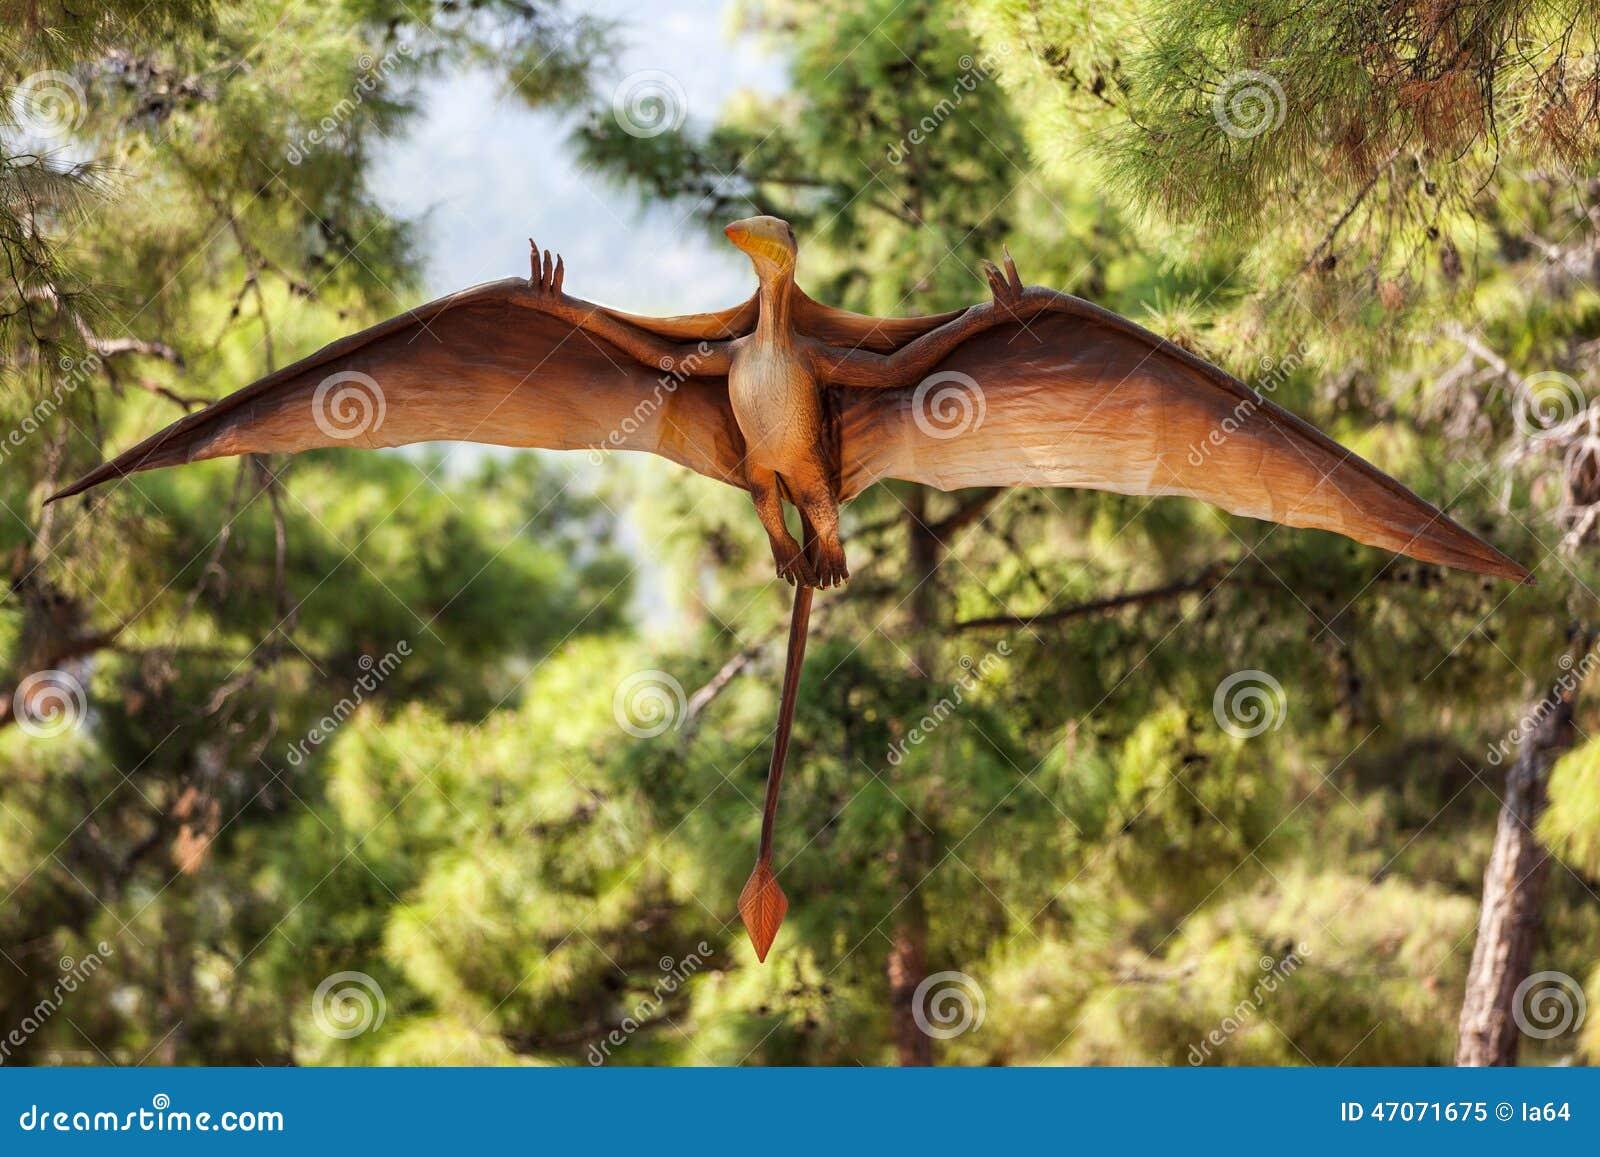 Pterodactyl dinosaur flying at forest stock photo image - Dinosaur volant ...